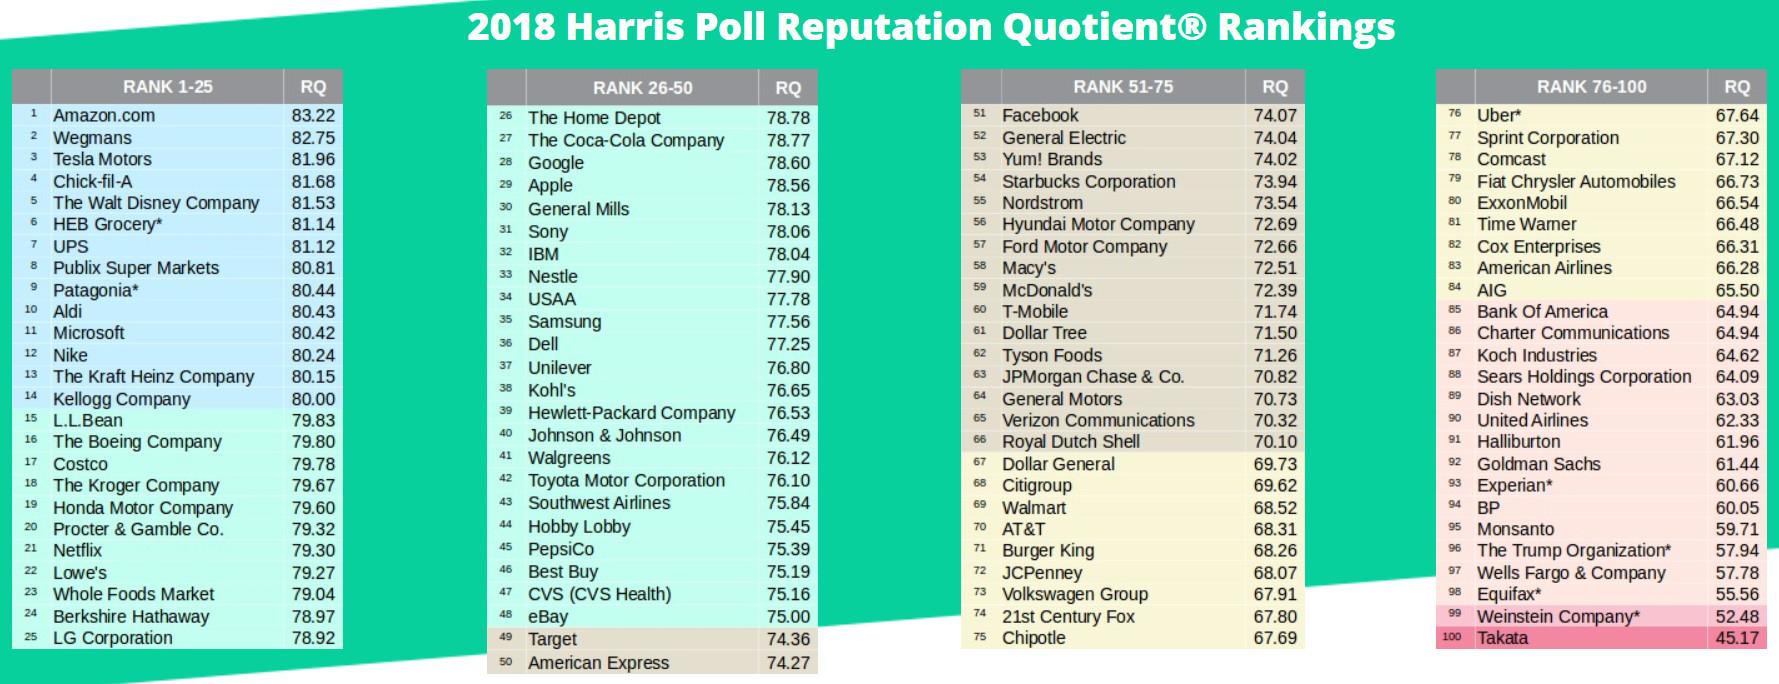 lista Harris